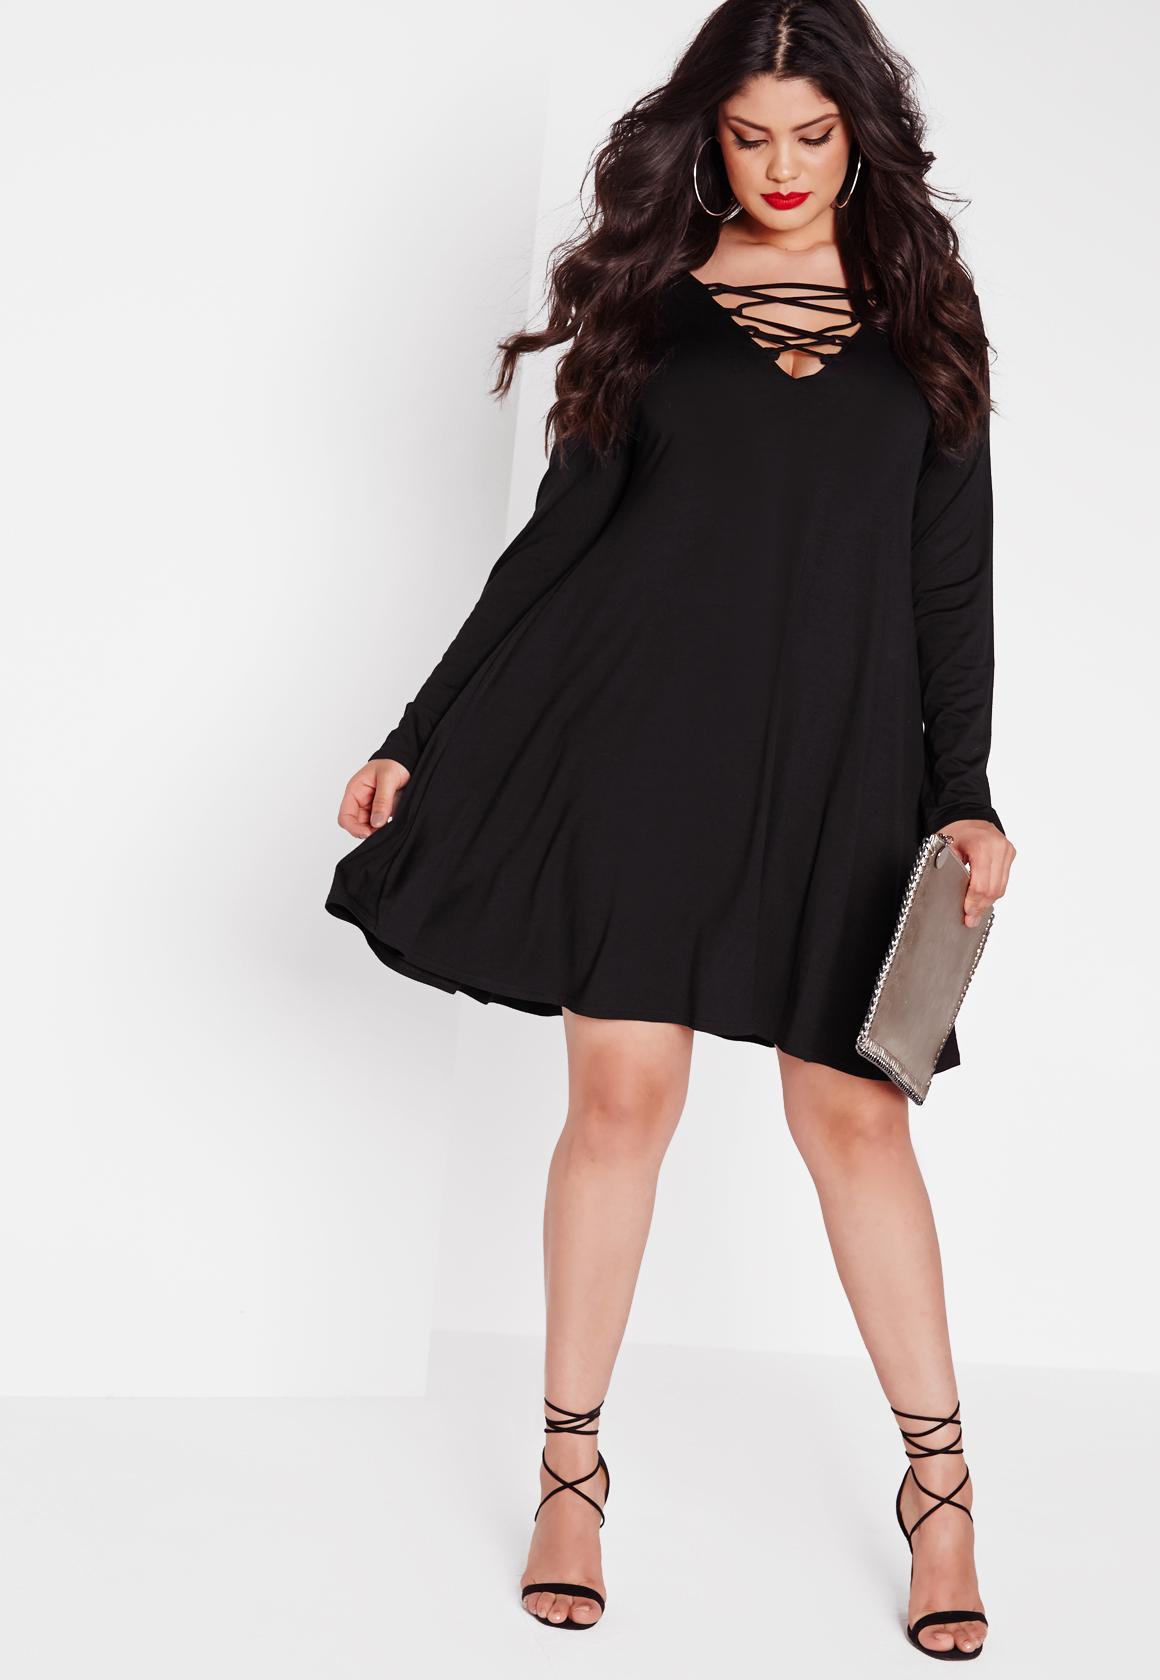 Robe noir classe grande taille